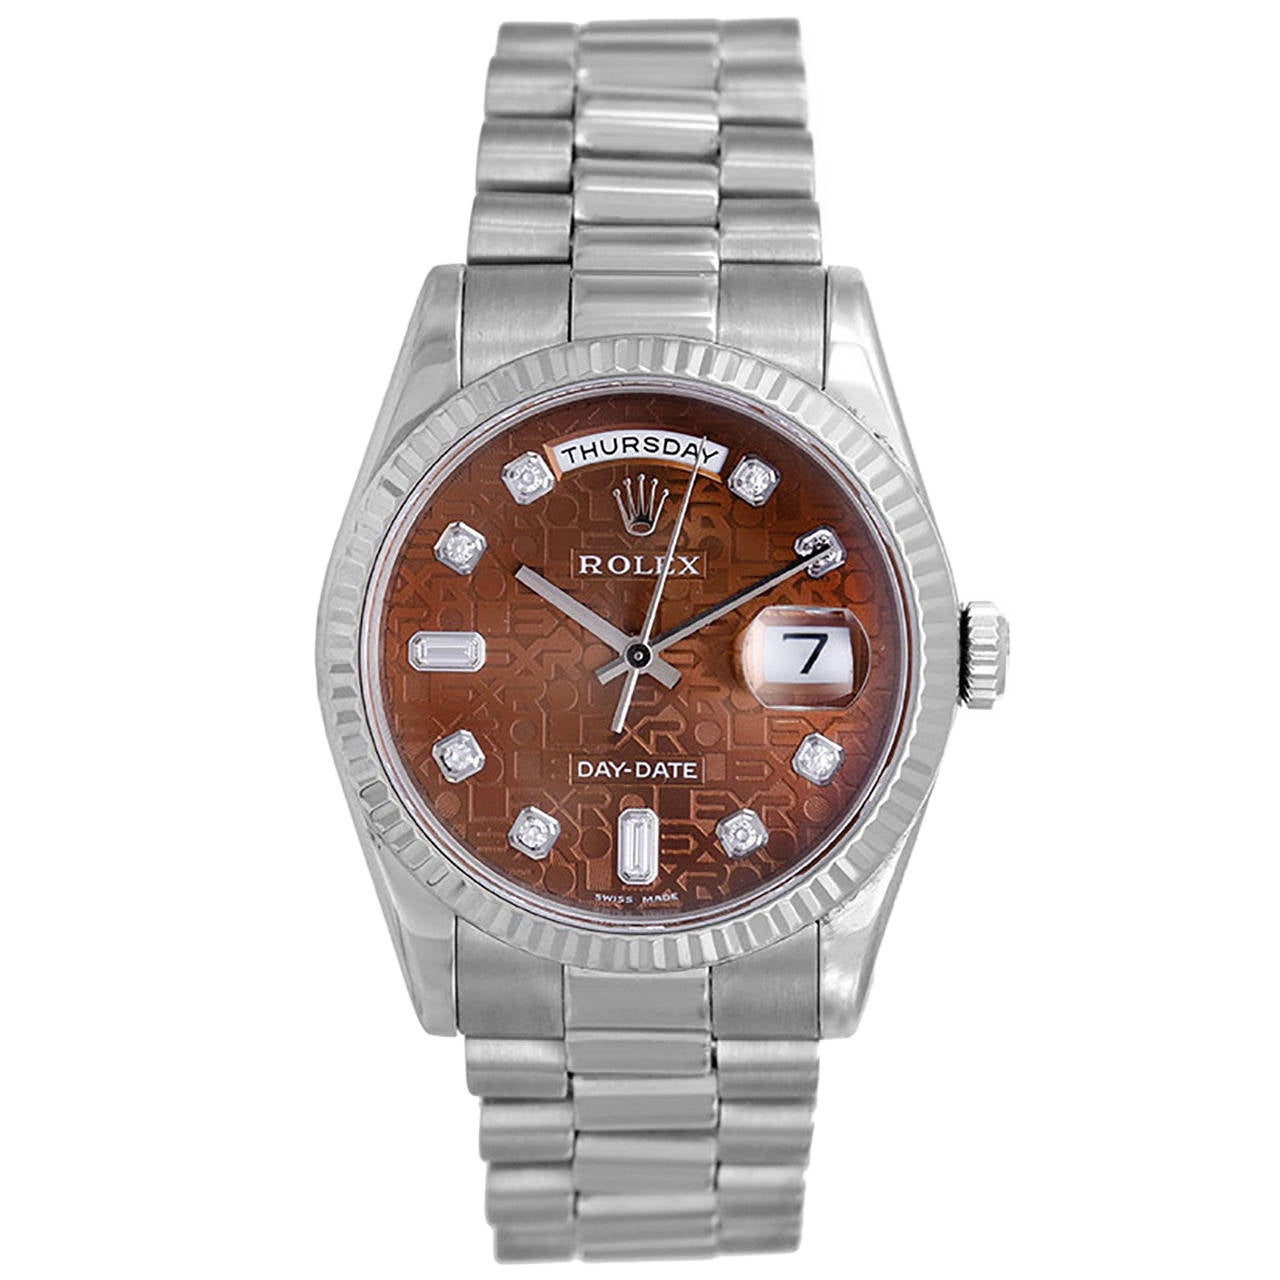 Rolex White Gold Day-Date Diamond Dial President Wristwatch Ref 118239